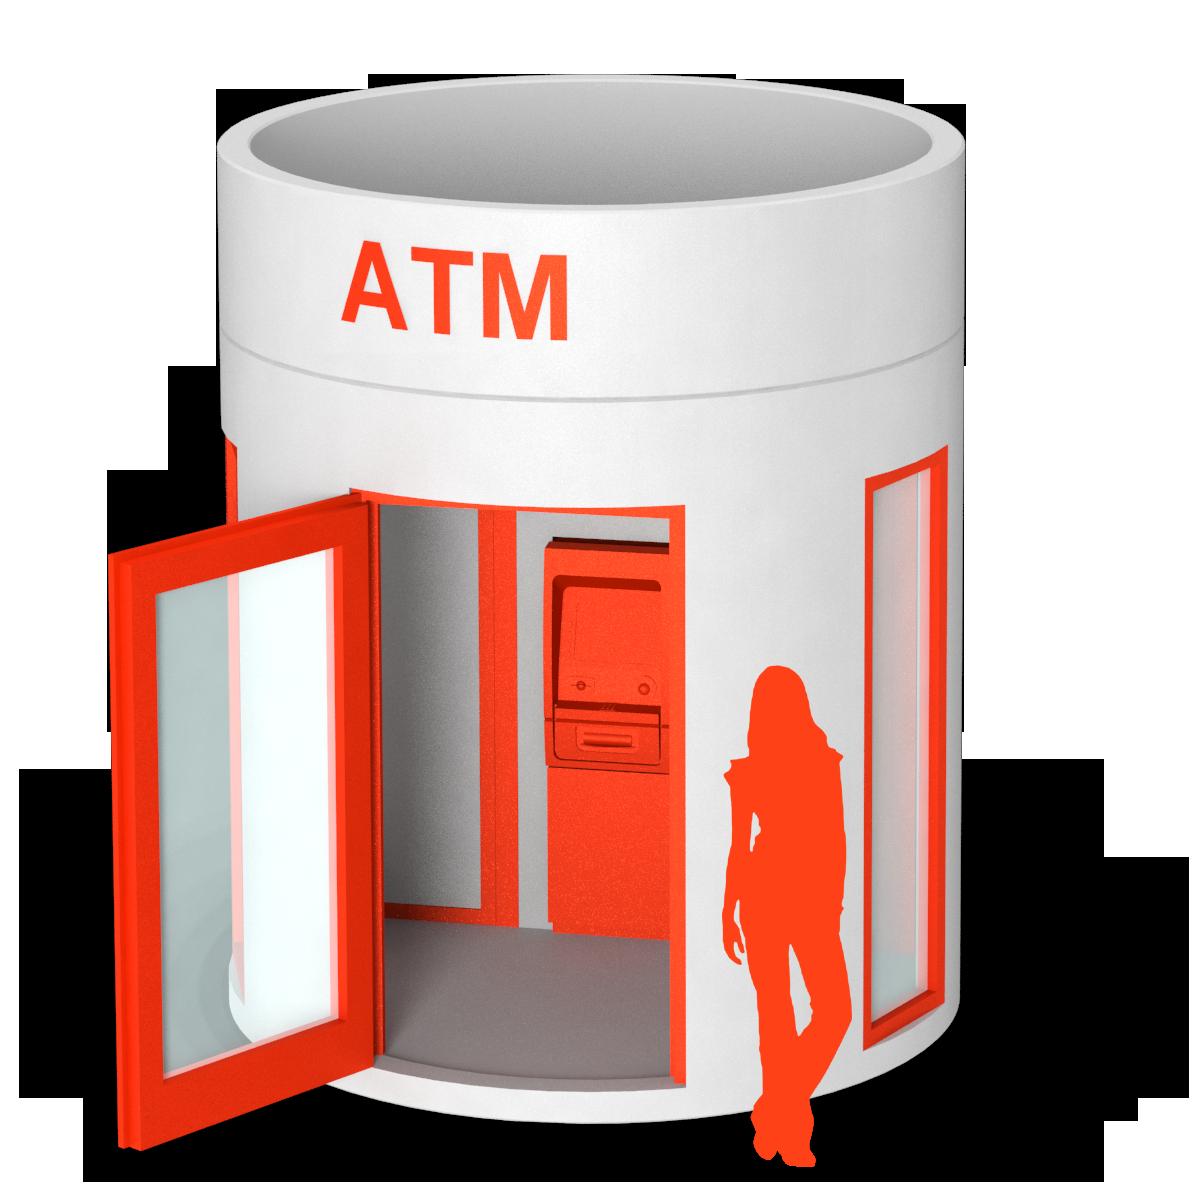 bboxx ATM 1 ATM with anteroom